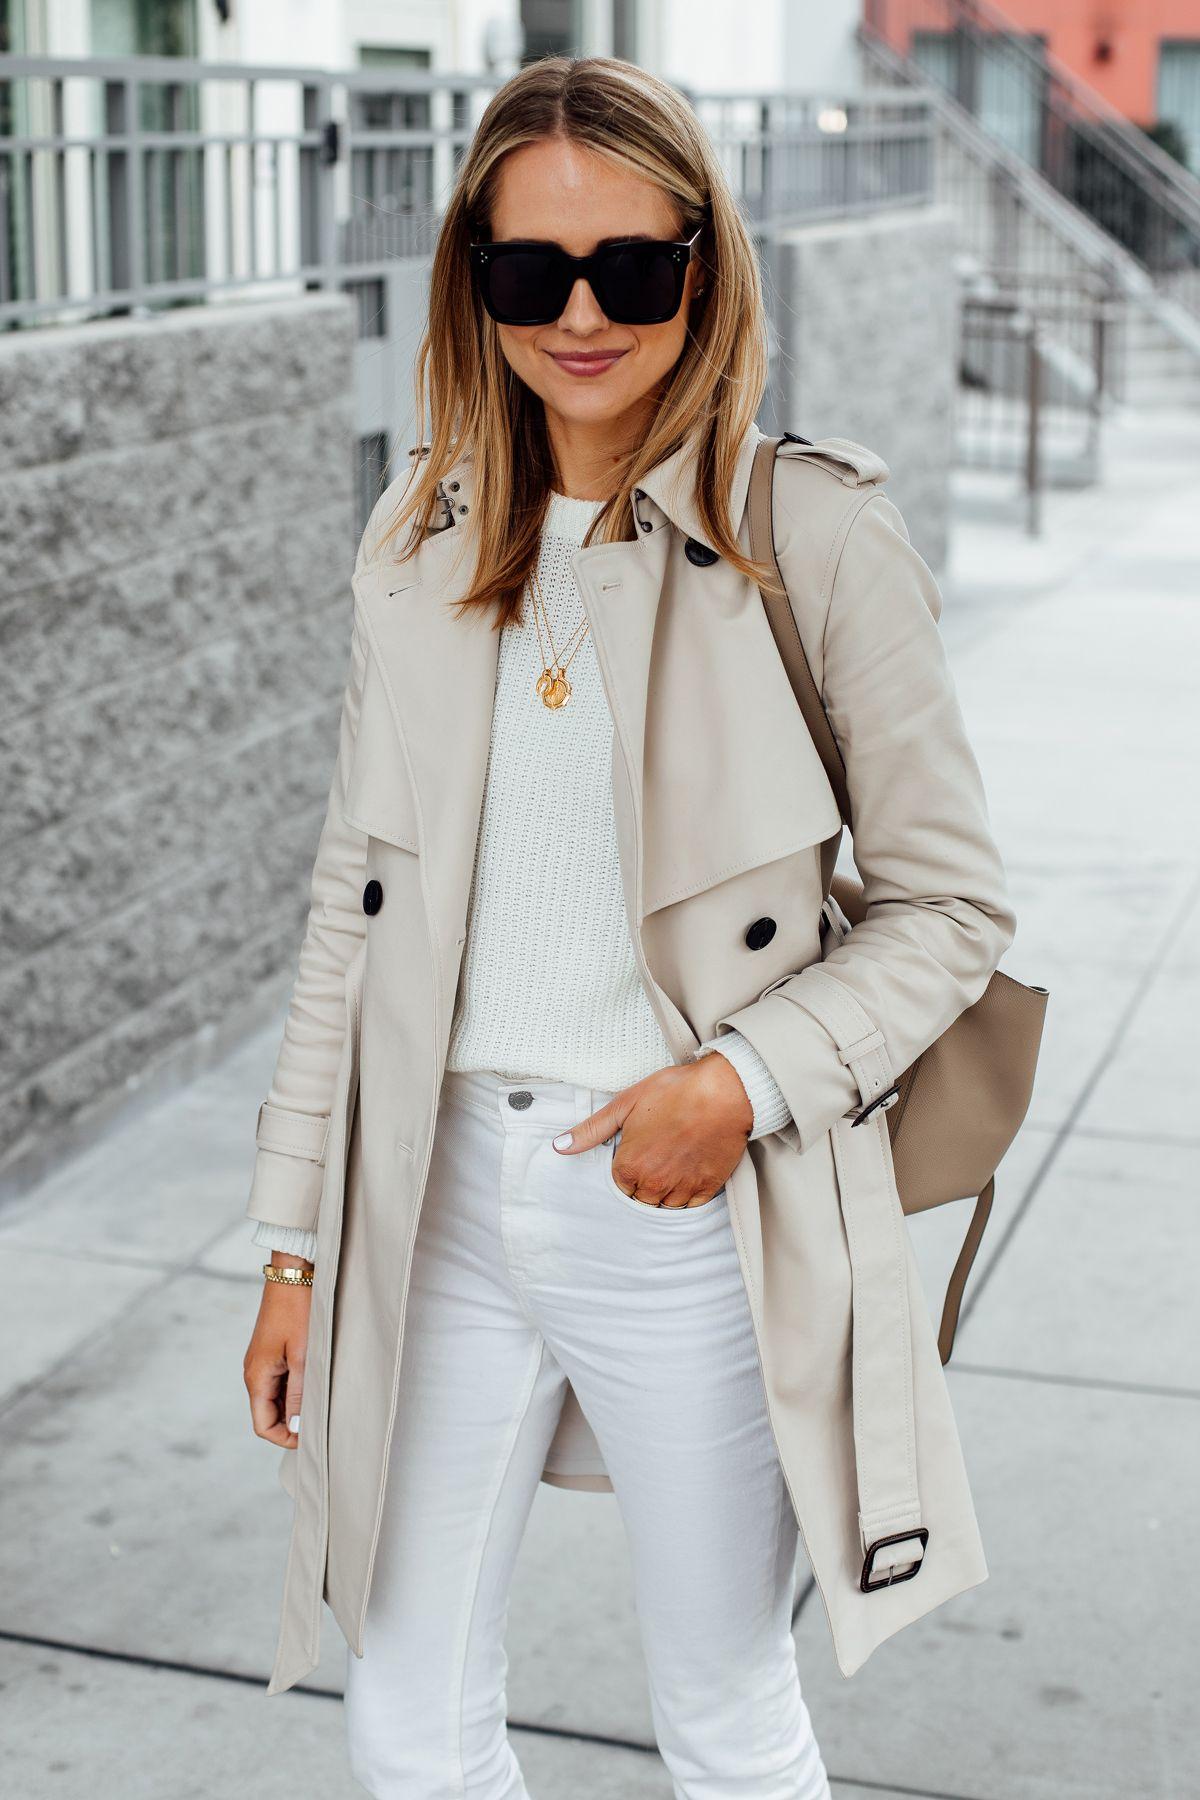 Fashion Jackson Wearing Club Monaco Trench Coat White Sweater White Jeans Celine Mini Belt Bag 1 Fashion Jackson Coat Outfits Trench Coat Outfit [ 1800 x 1200 Pixel ]